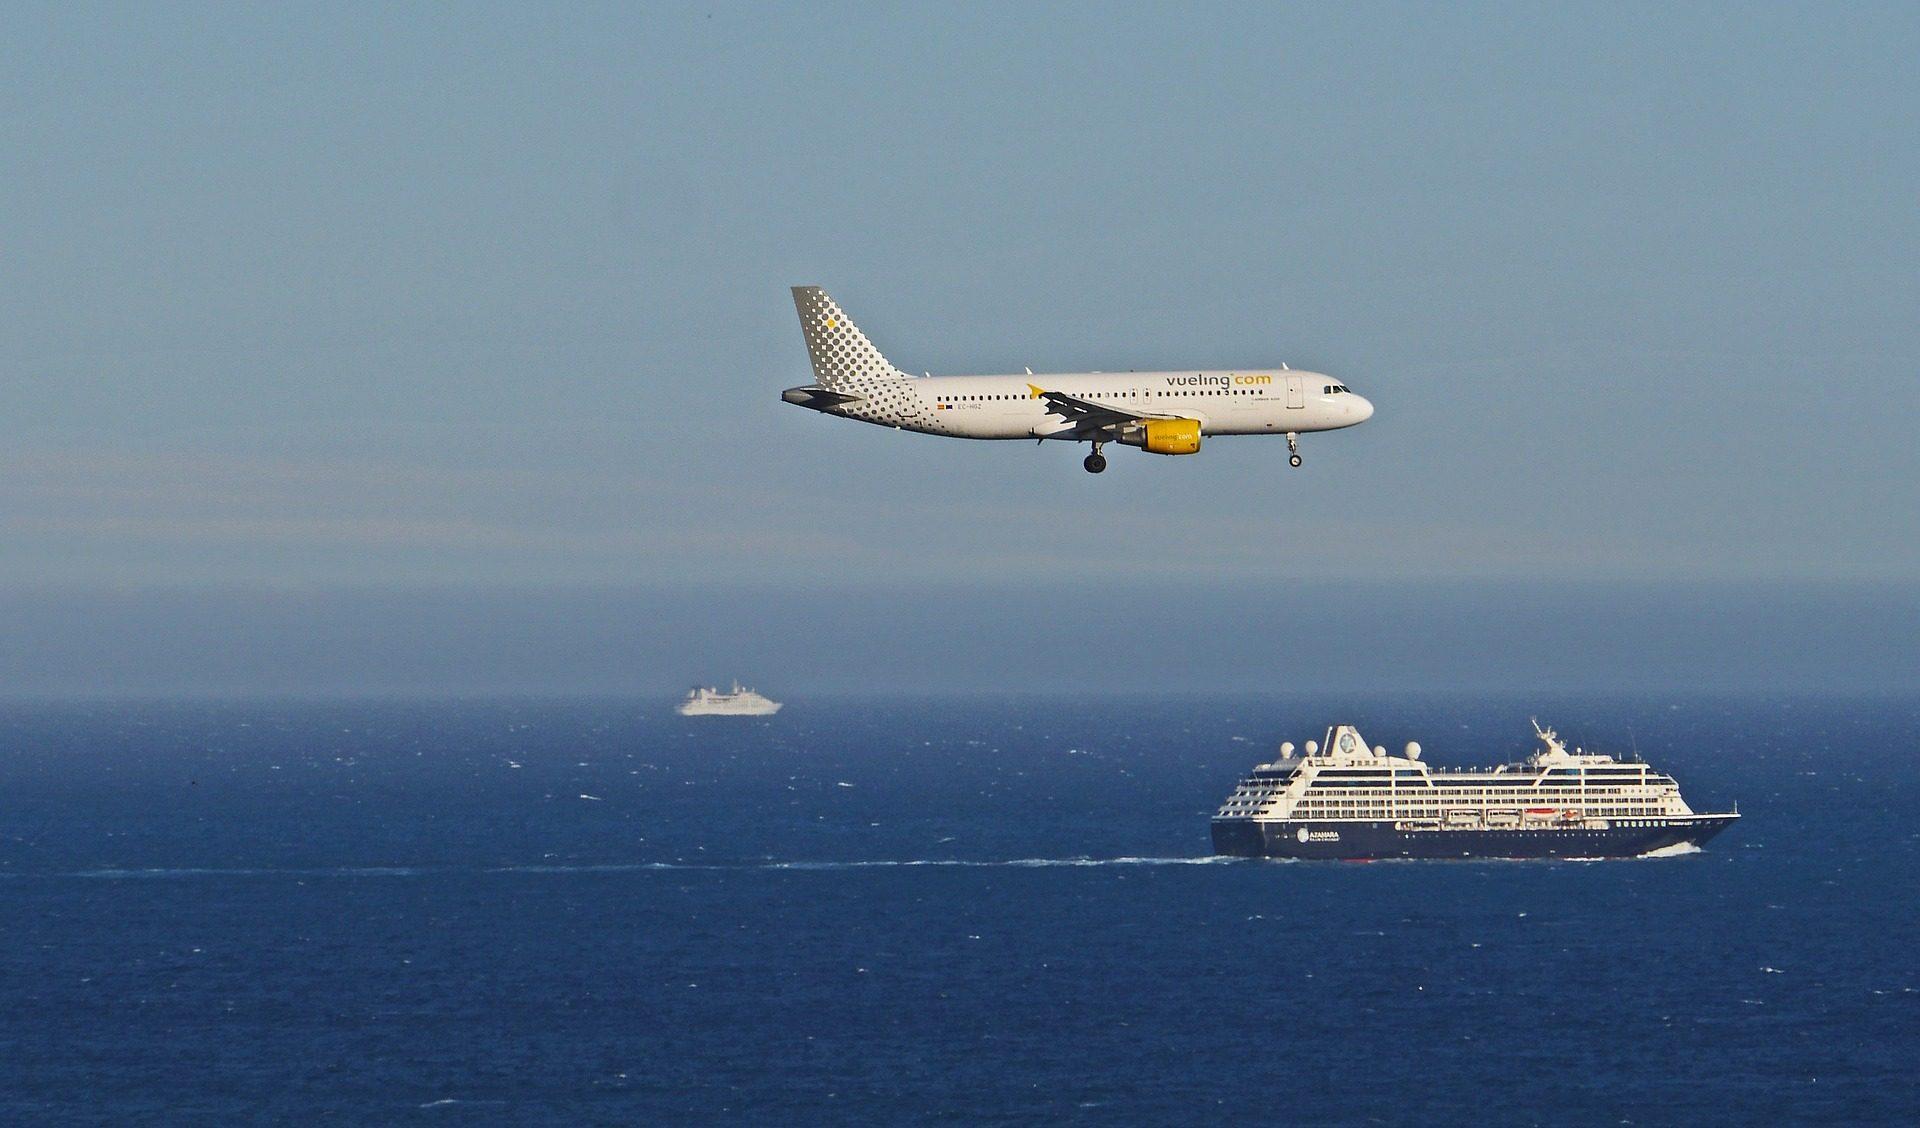 Günstige Mittel Meerkreuzfahrt - Mittelmeerkreuzfahrt 8 Tage auf See 1